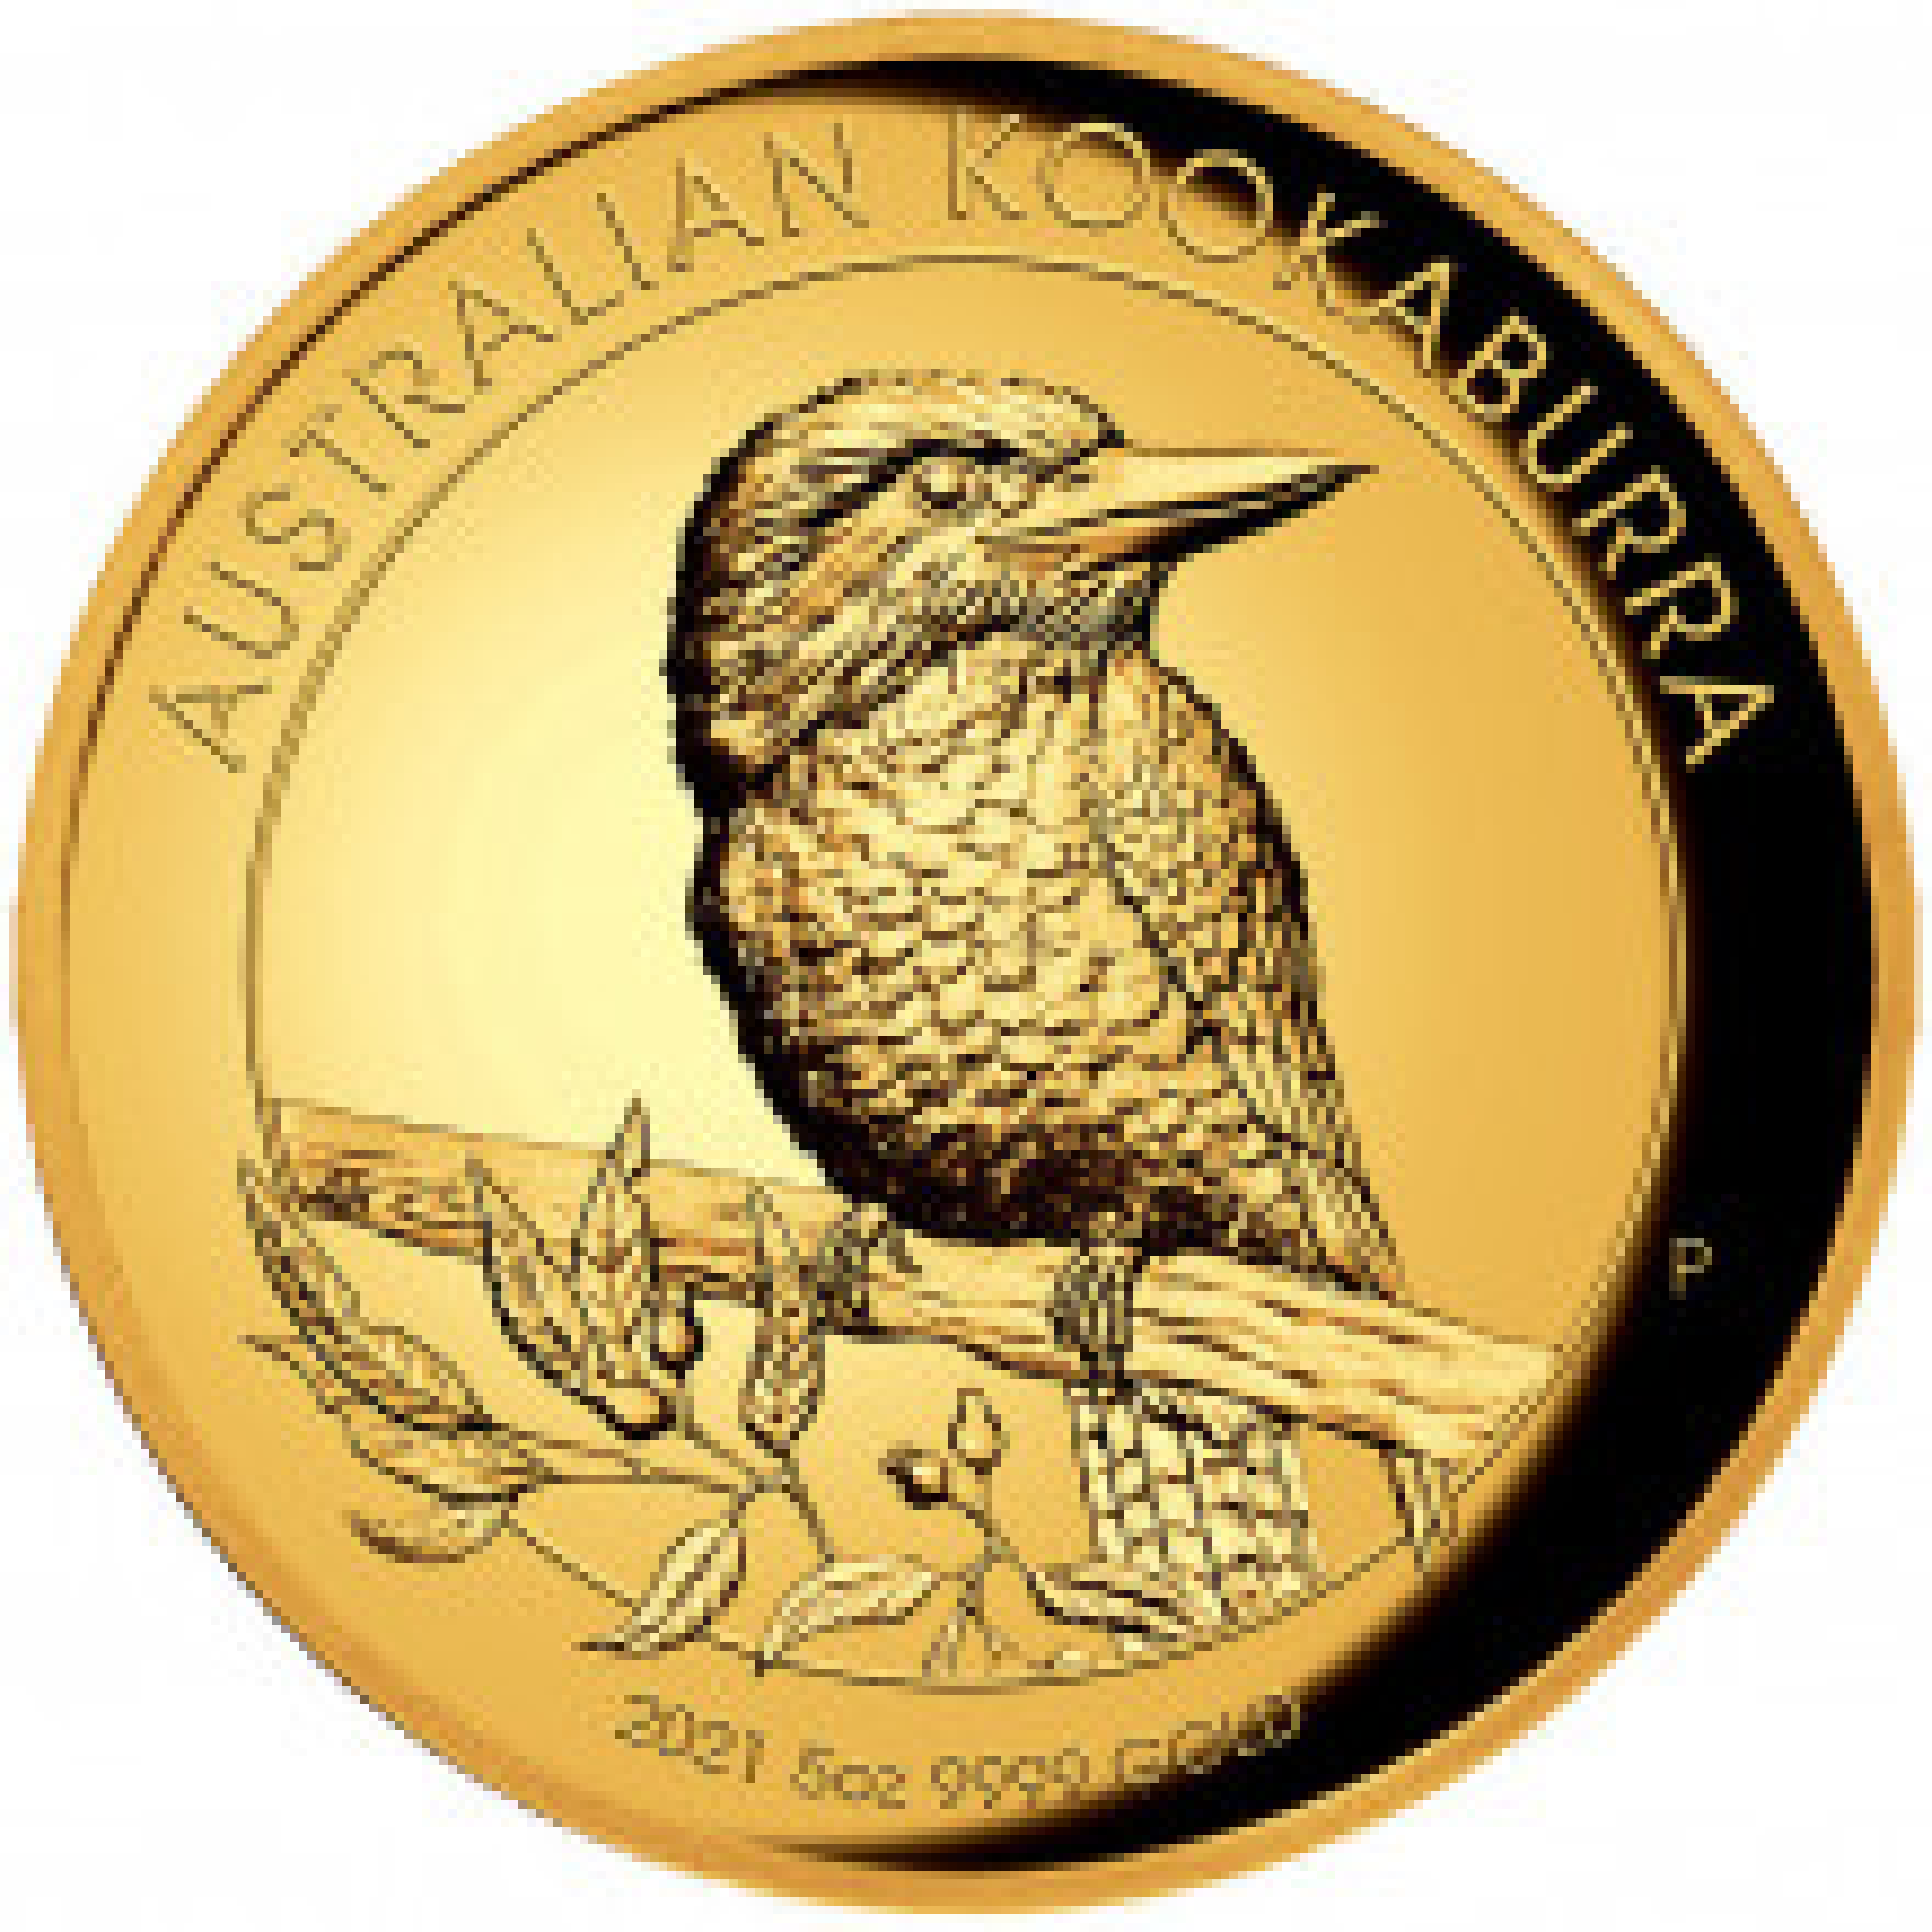 5 troy ounce gold coin Kookaburra 2021 Proof